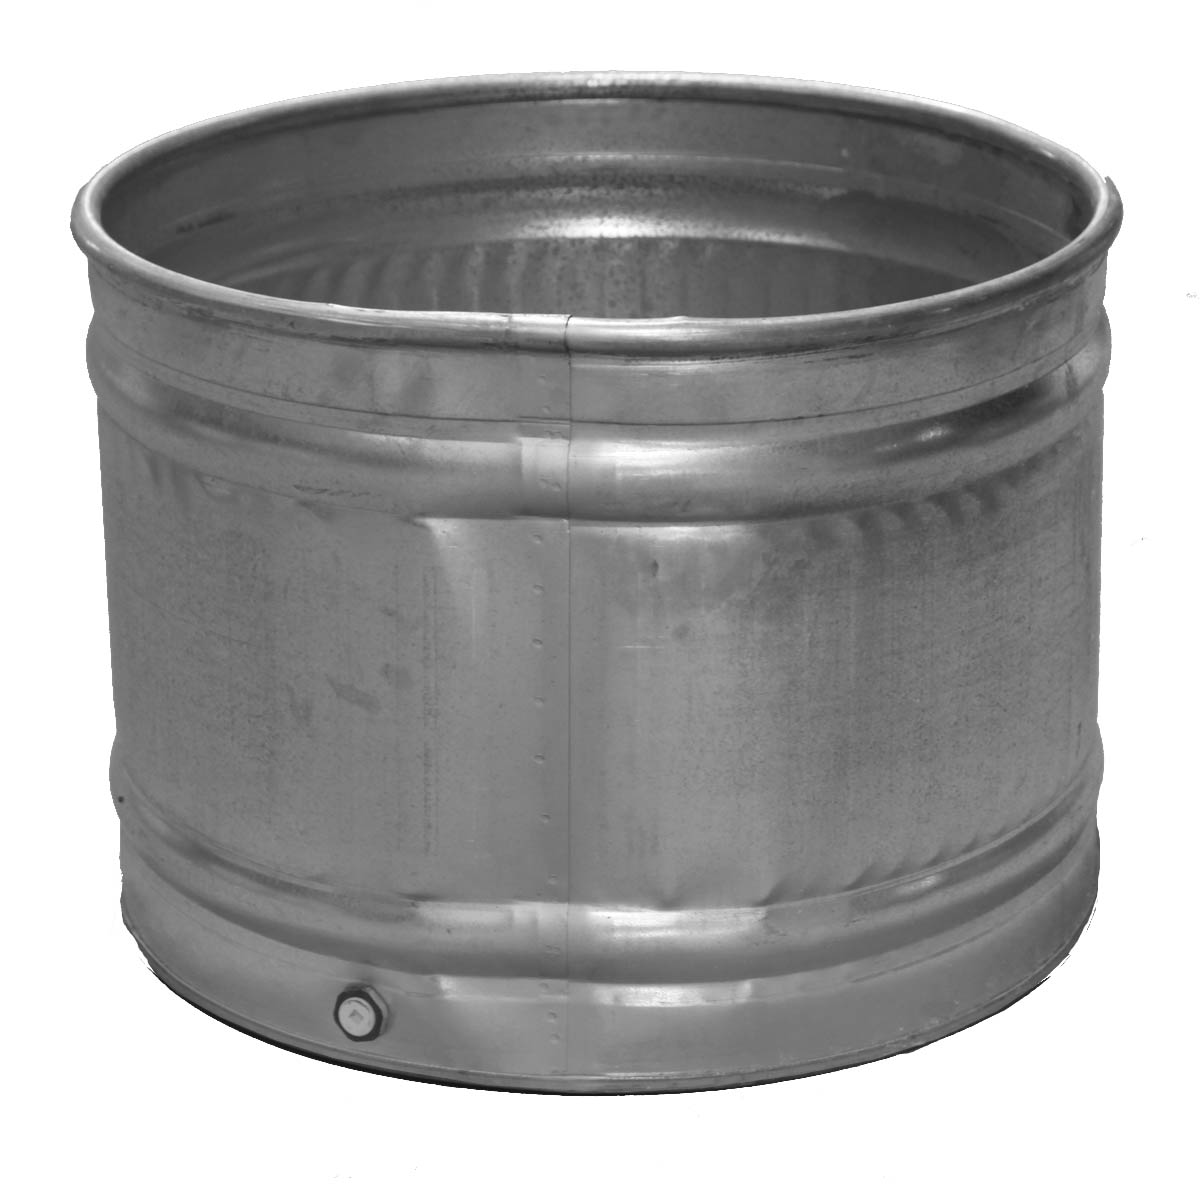 ROUND STOCK WATERING TANK - R-32 - 70 GAL (85 US Gal)